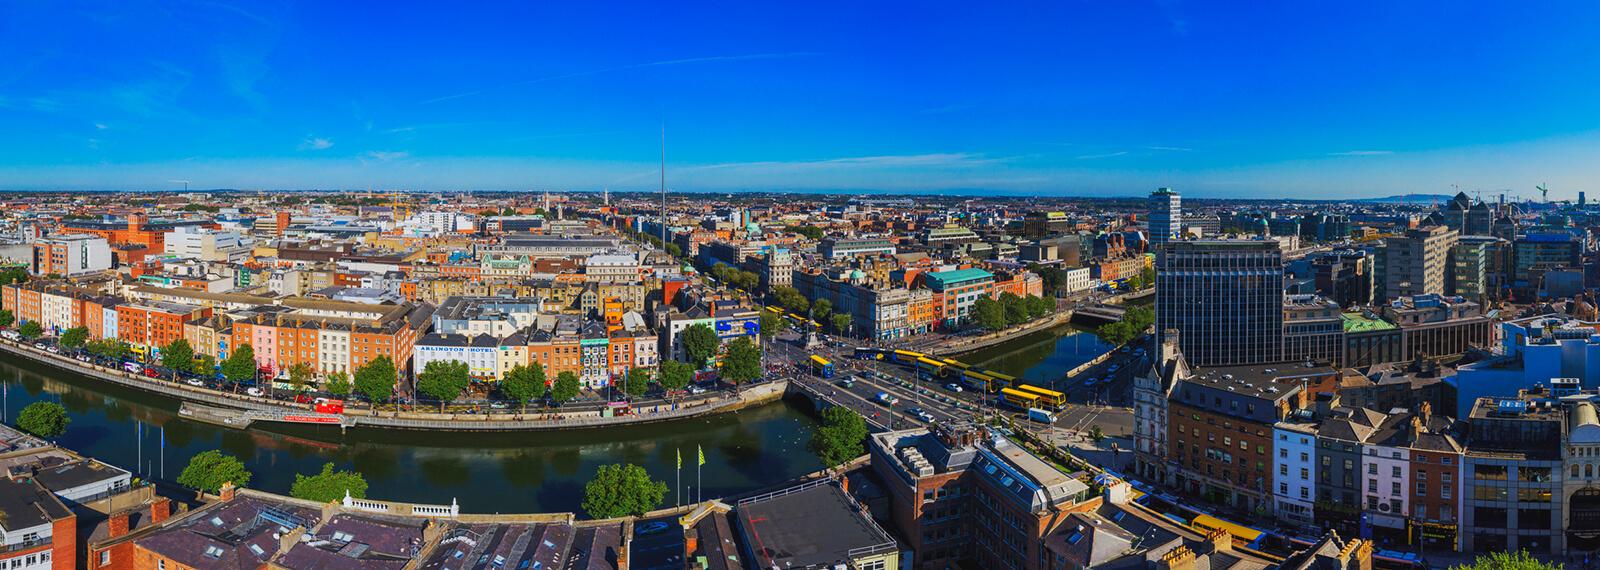 Aerial photo of Dublin City